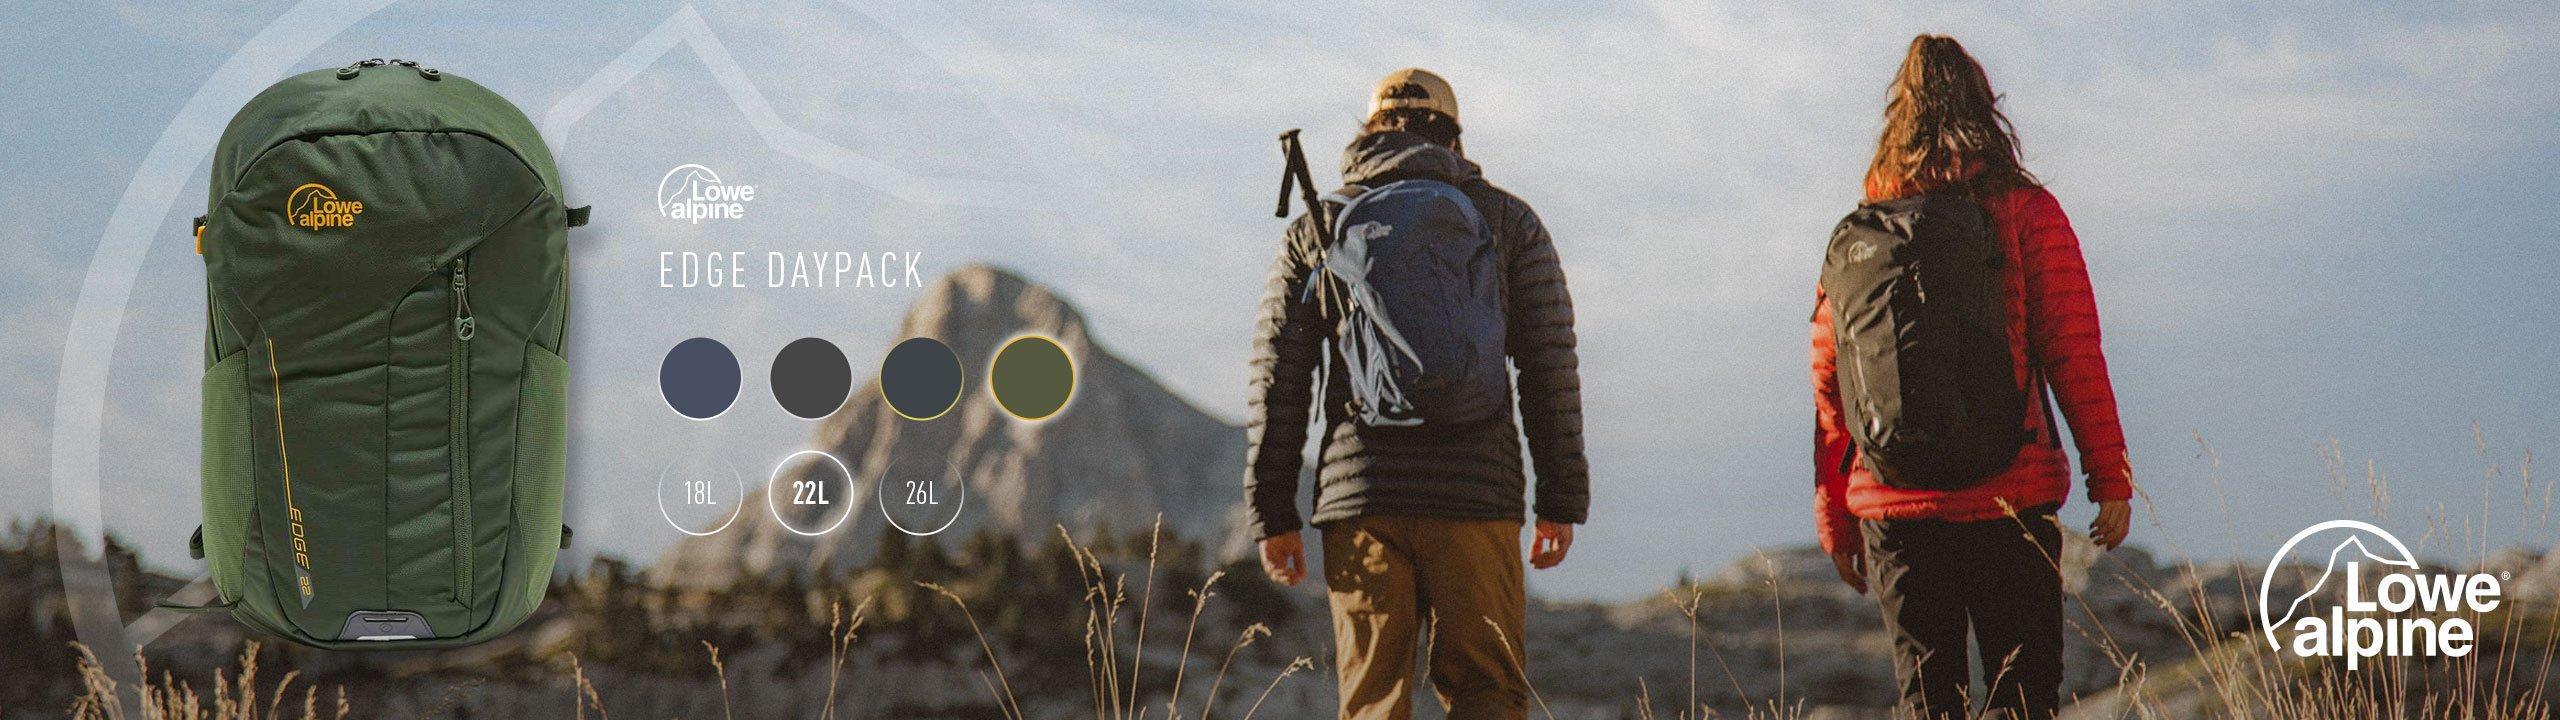 Lowe Alpine Edge Daypacks